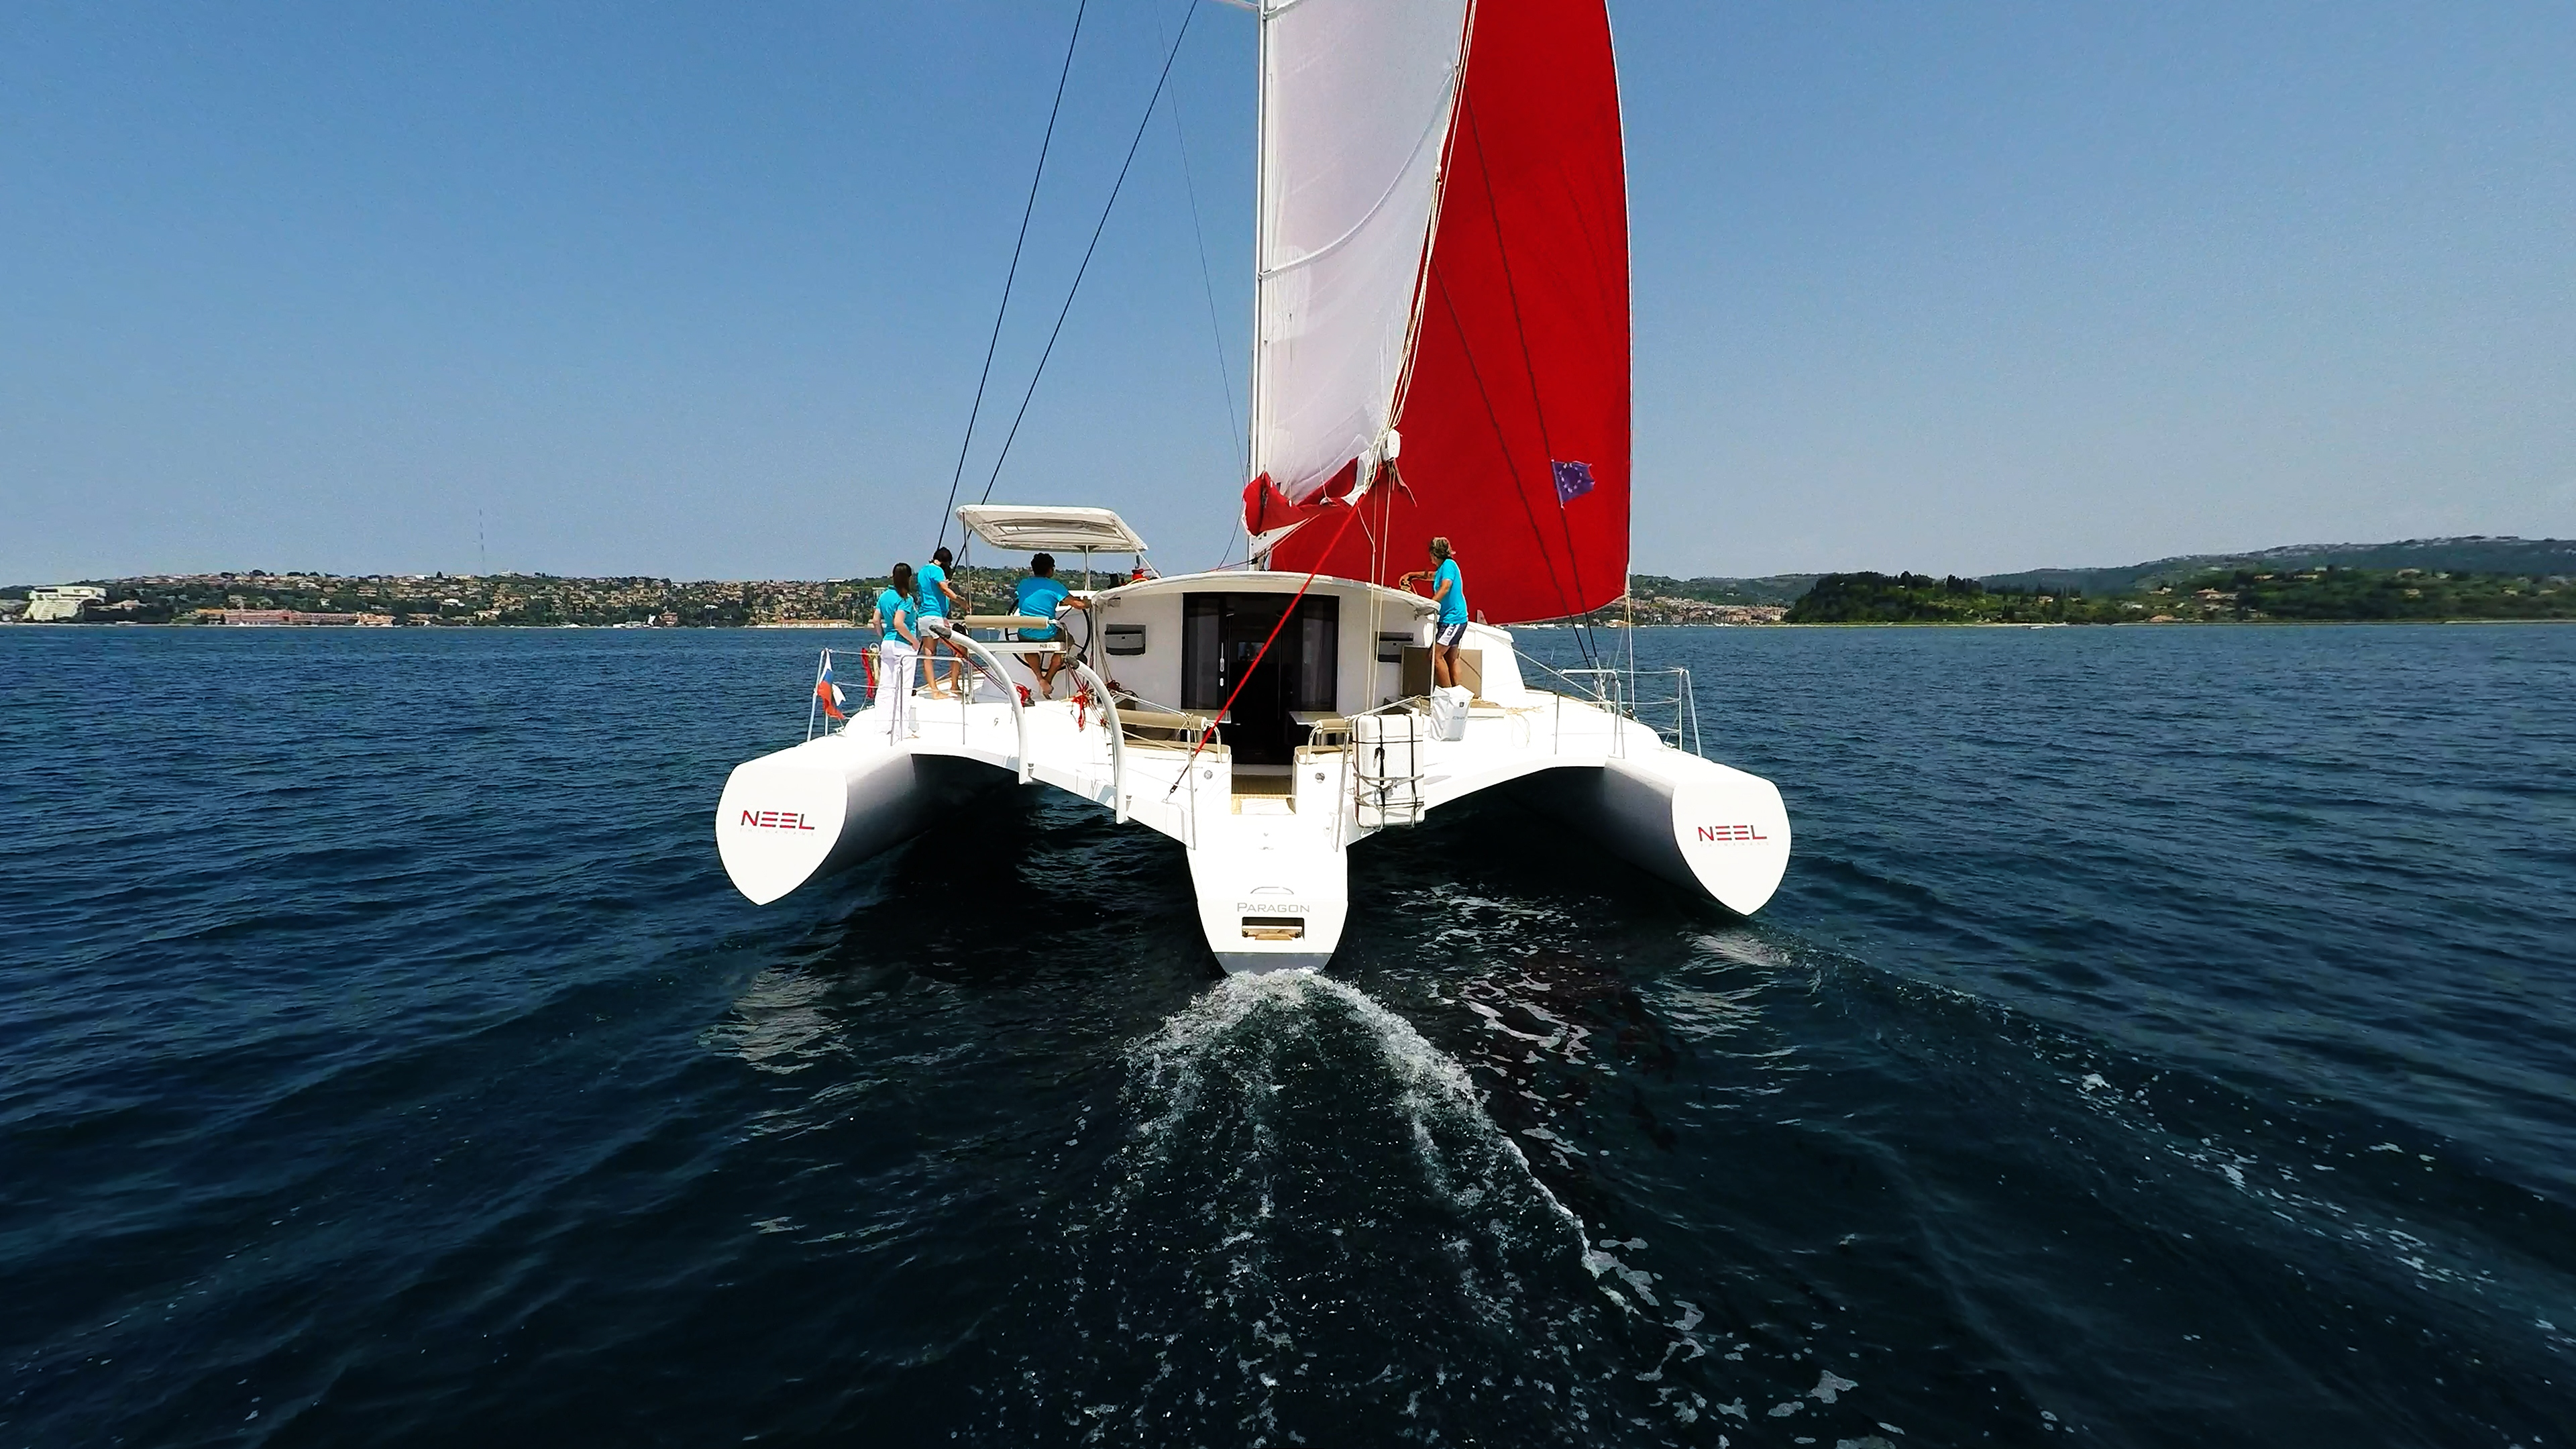 stern view of trimaran multihull yacht sailing